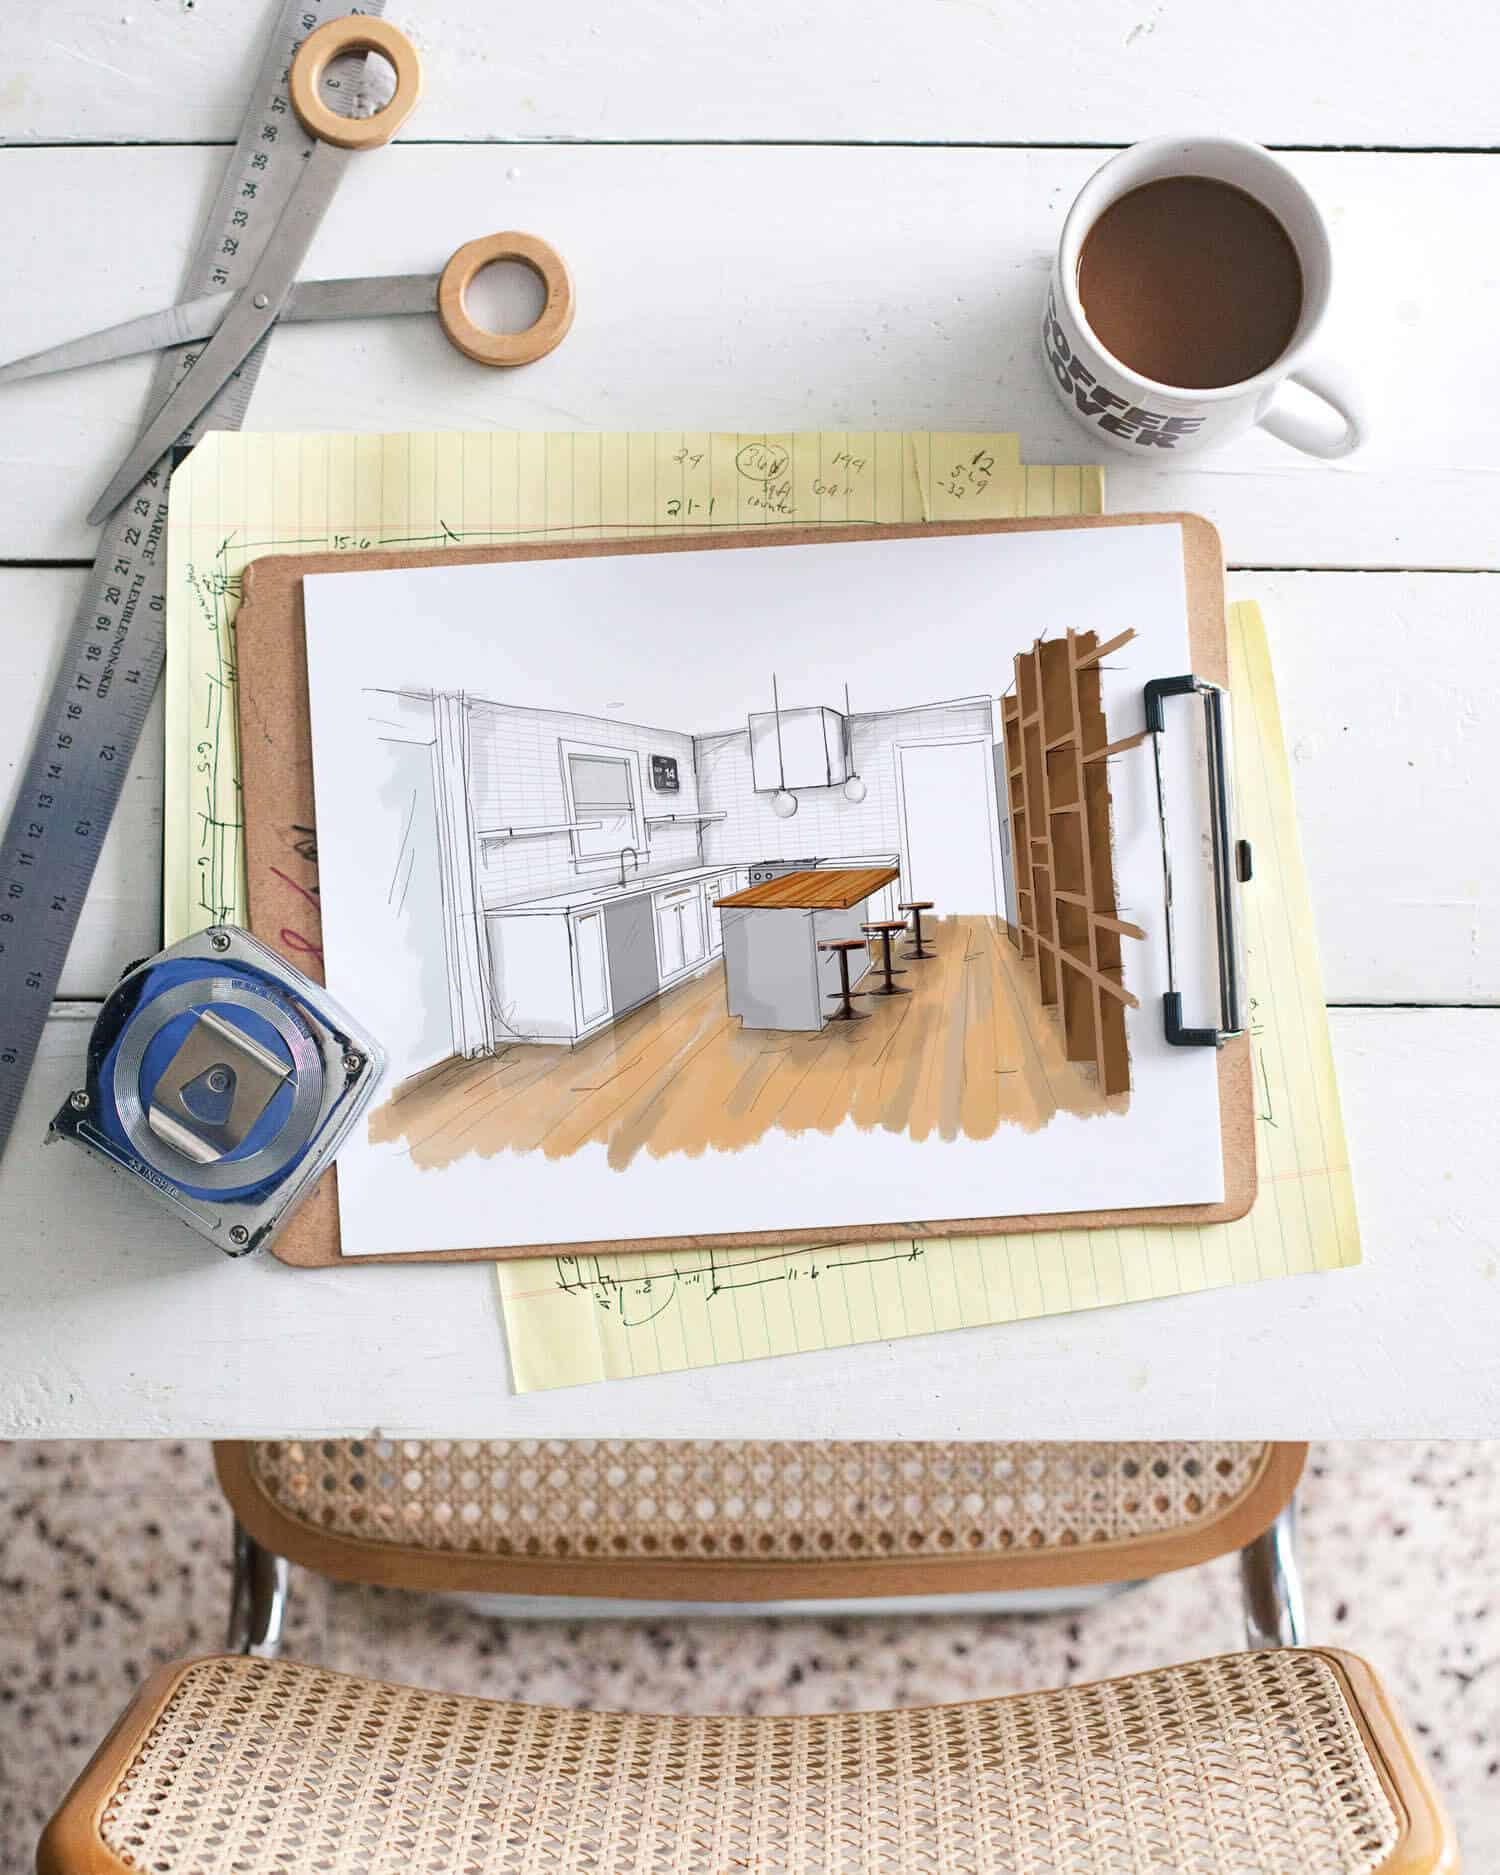 planning-a-budget-kitchen-renovation.jpg